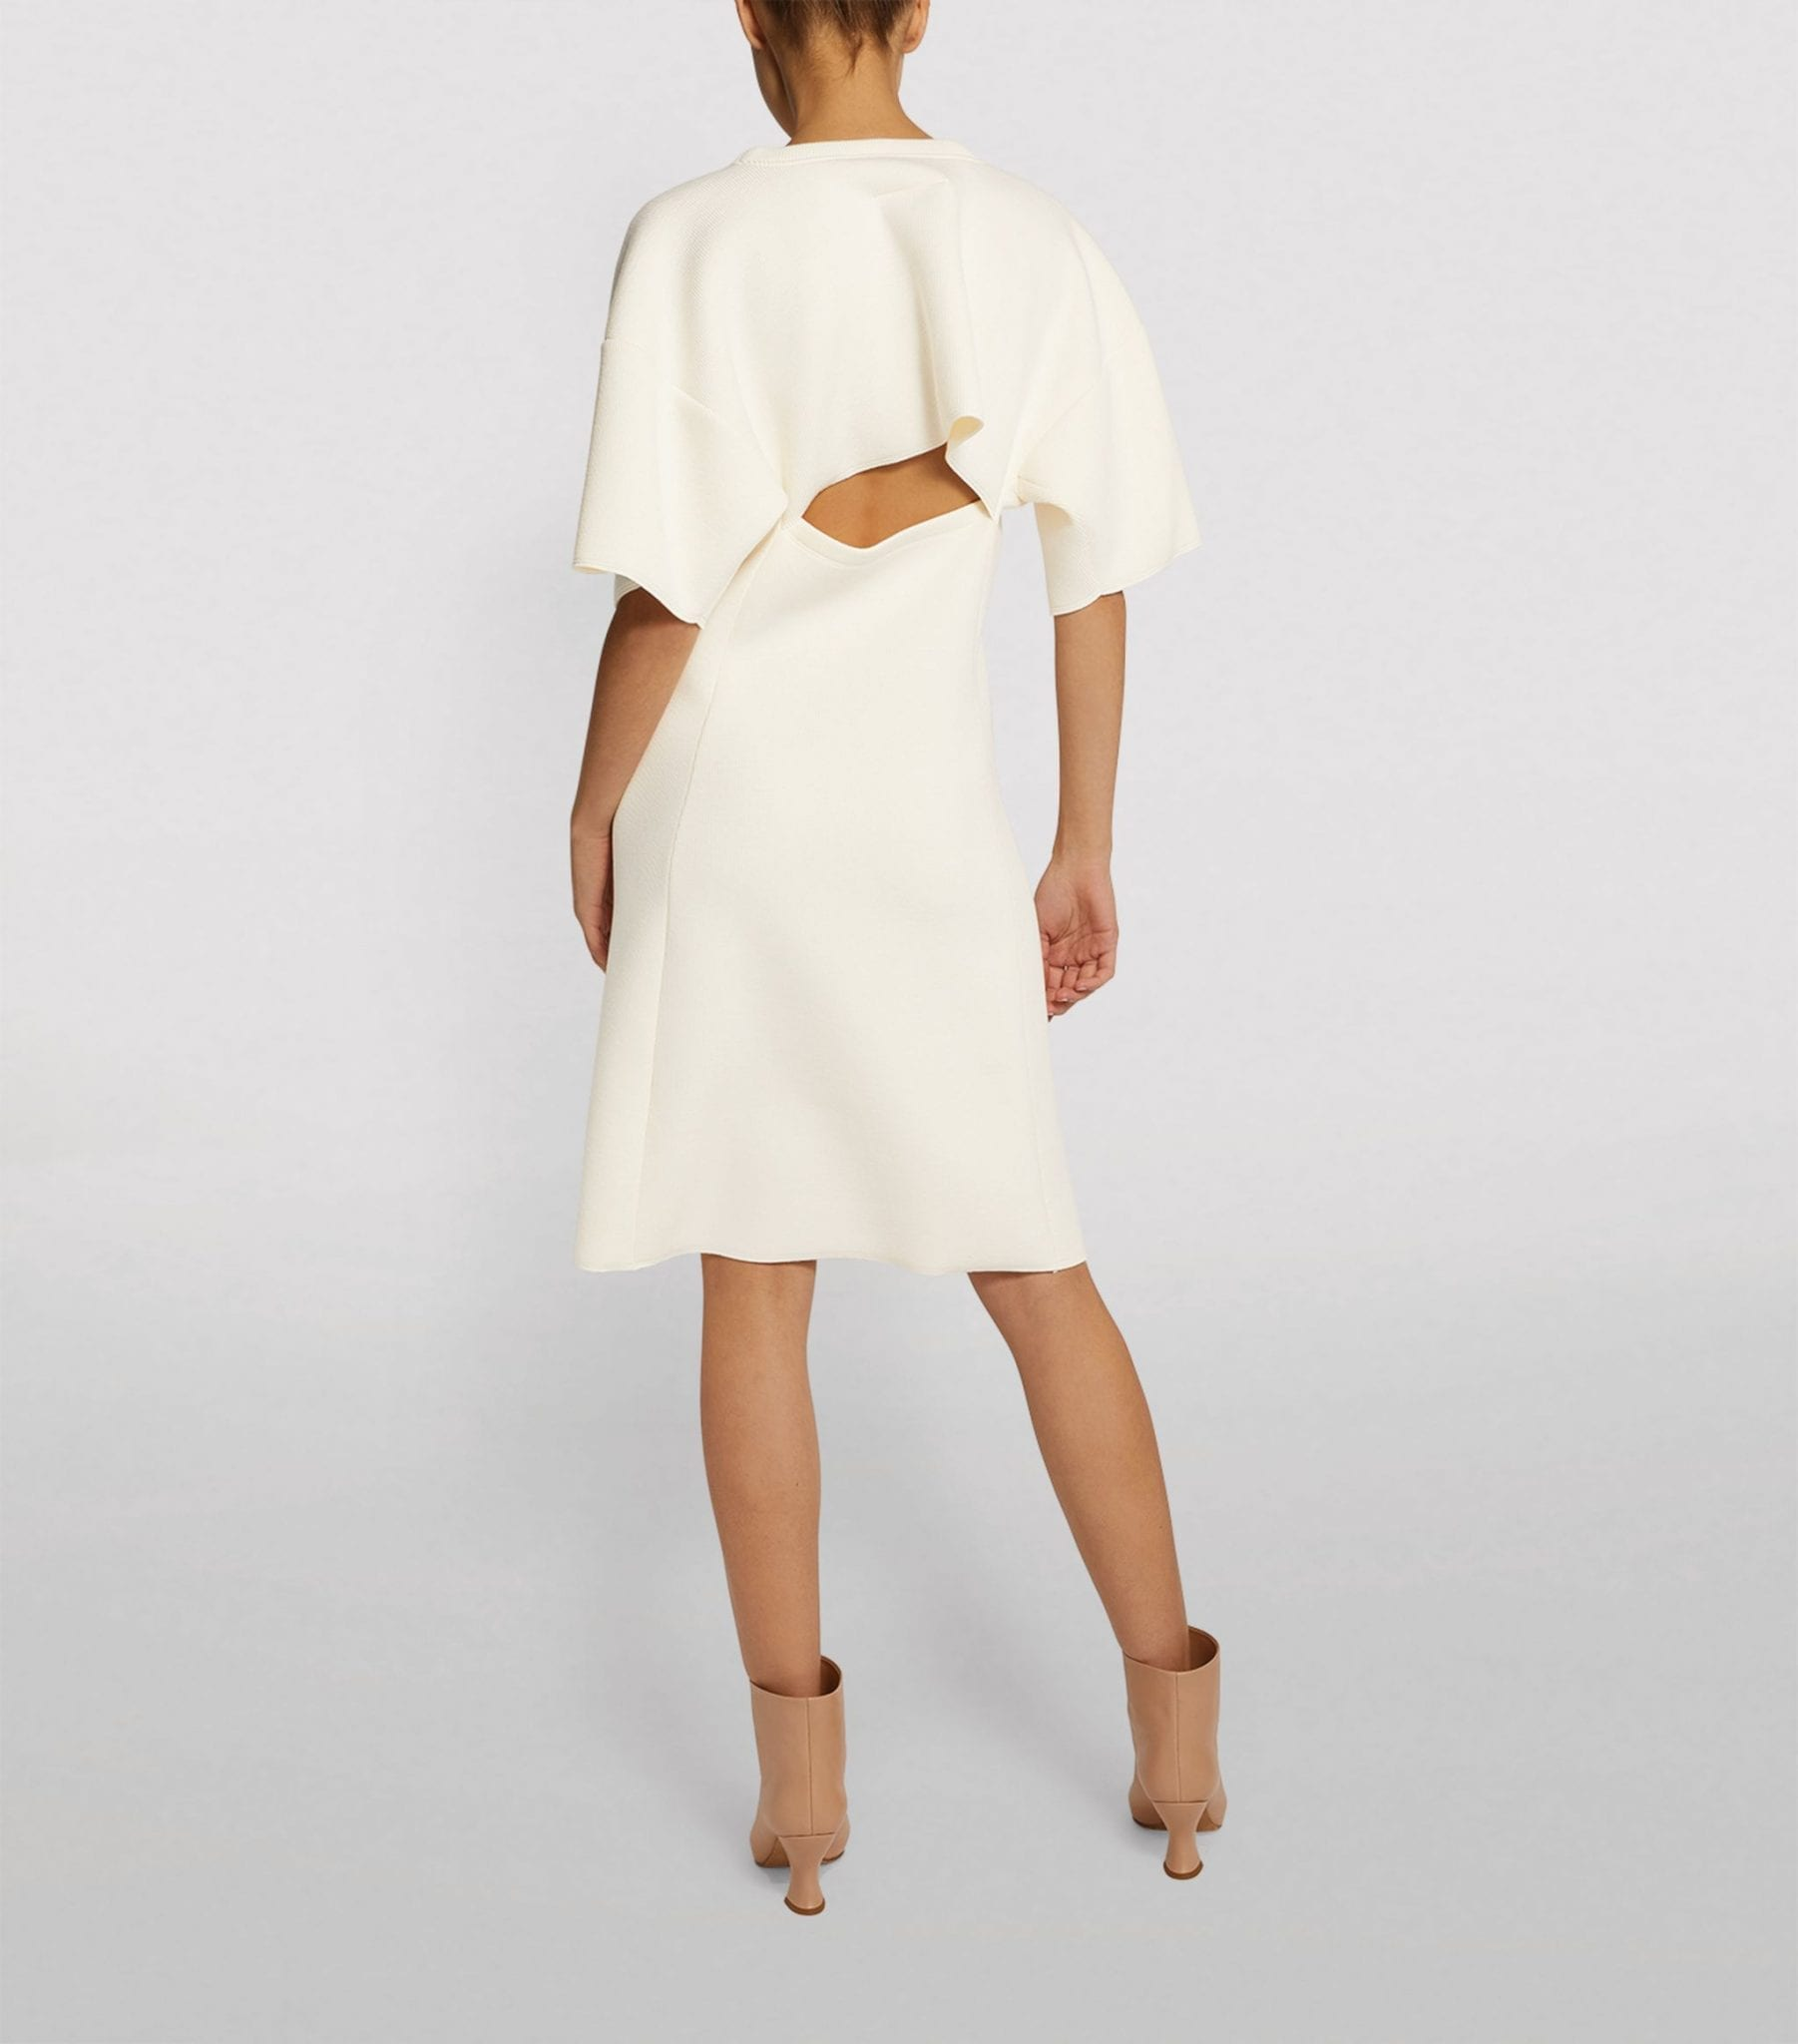 MM6 MAISON MARGIELA Back Cut-Out Jersey Dress